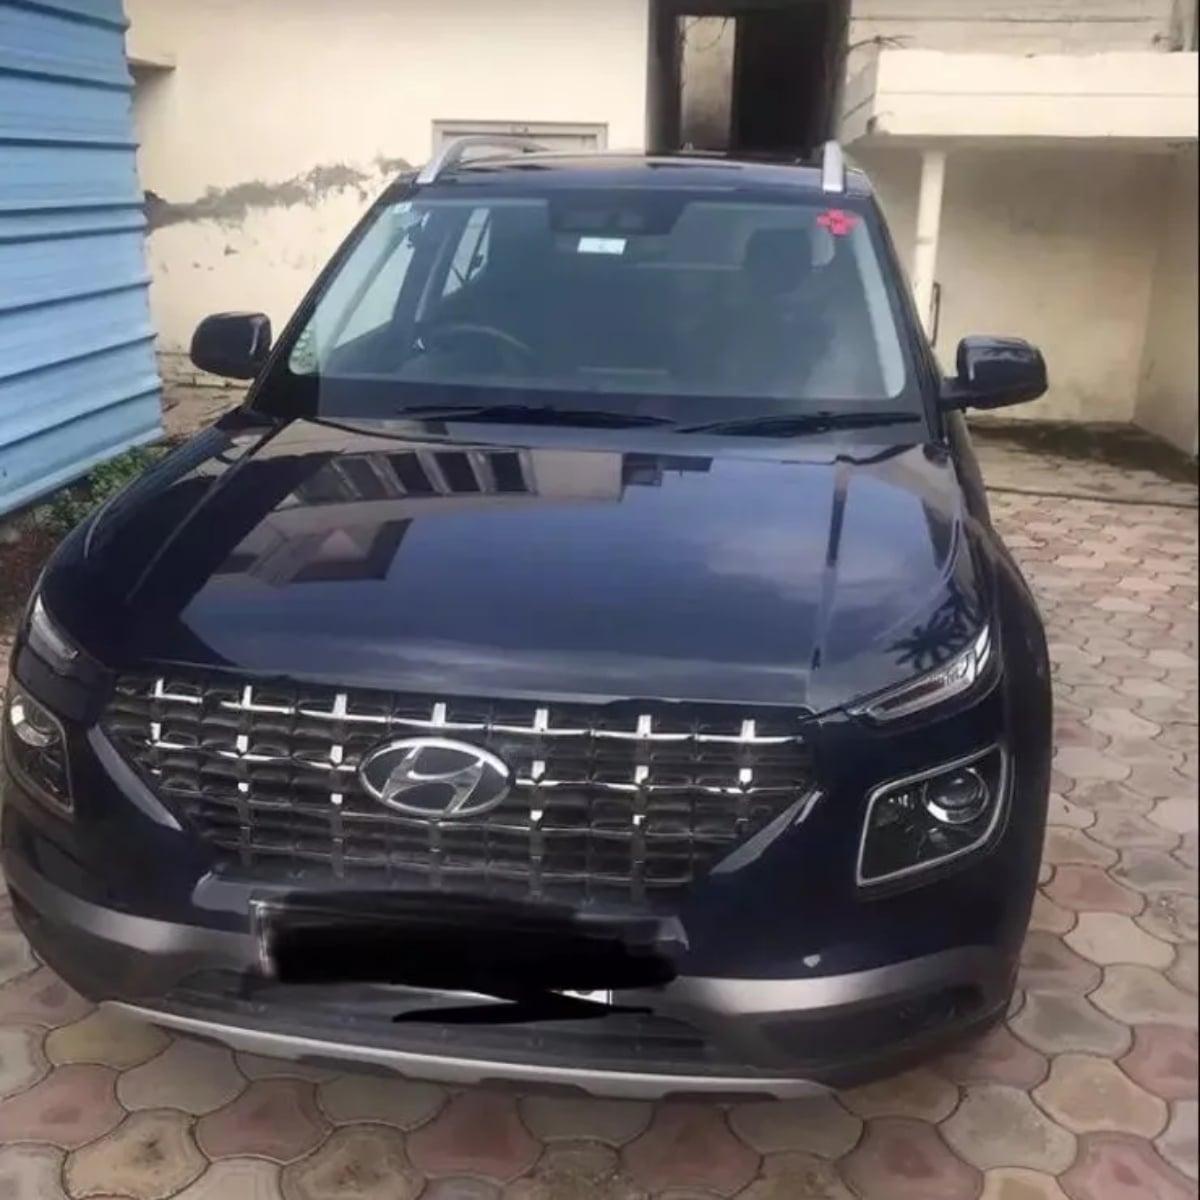 Hyundai Venue Top Model Second Hand At Just Rs 12.20 Lakh